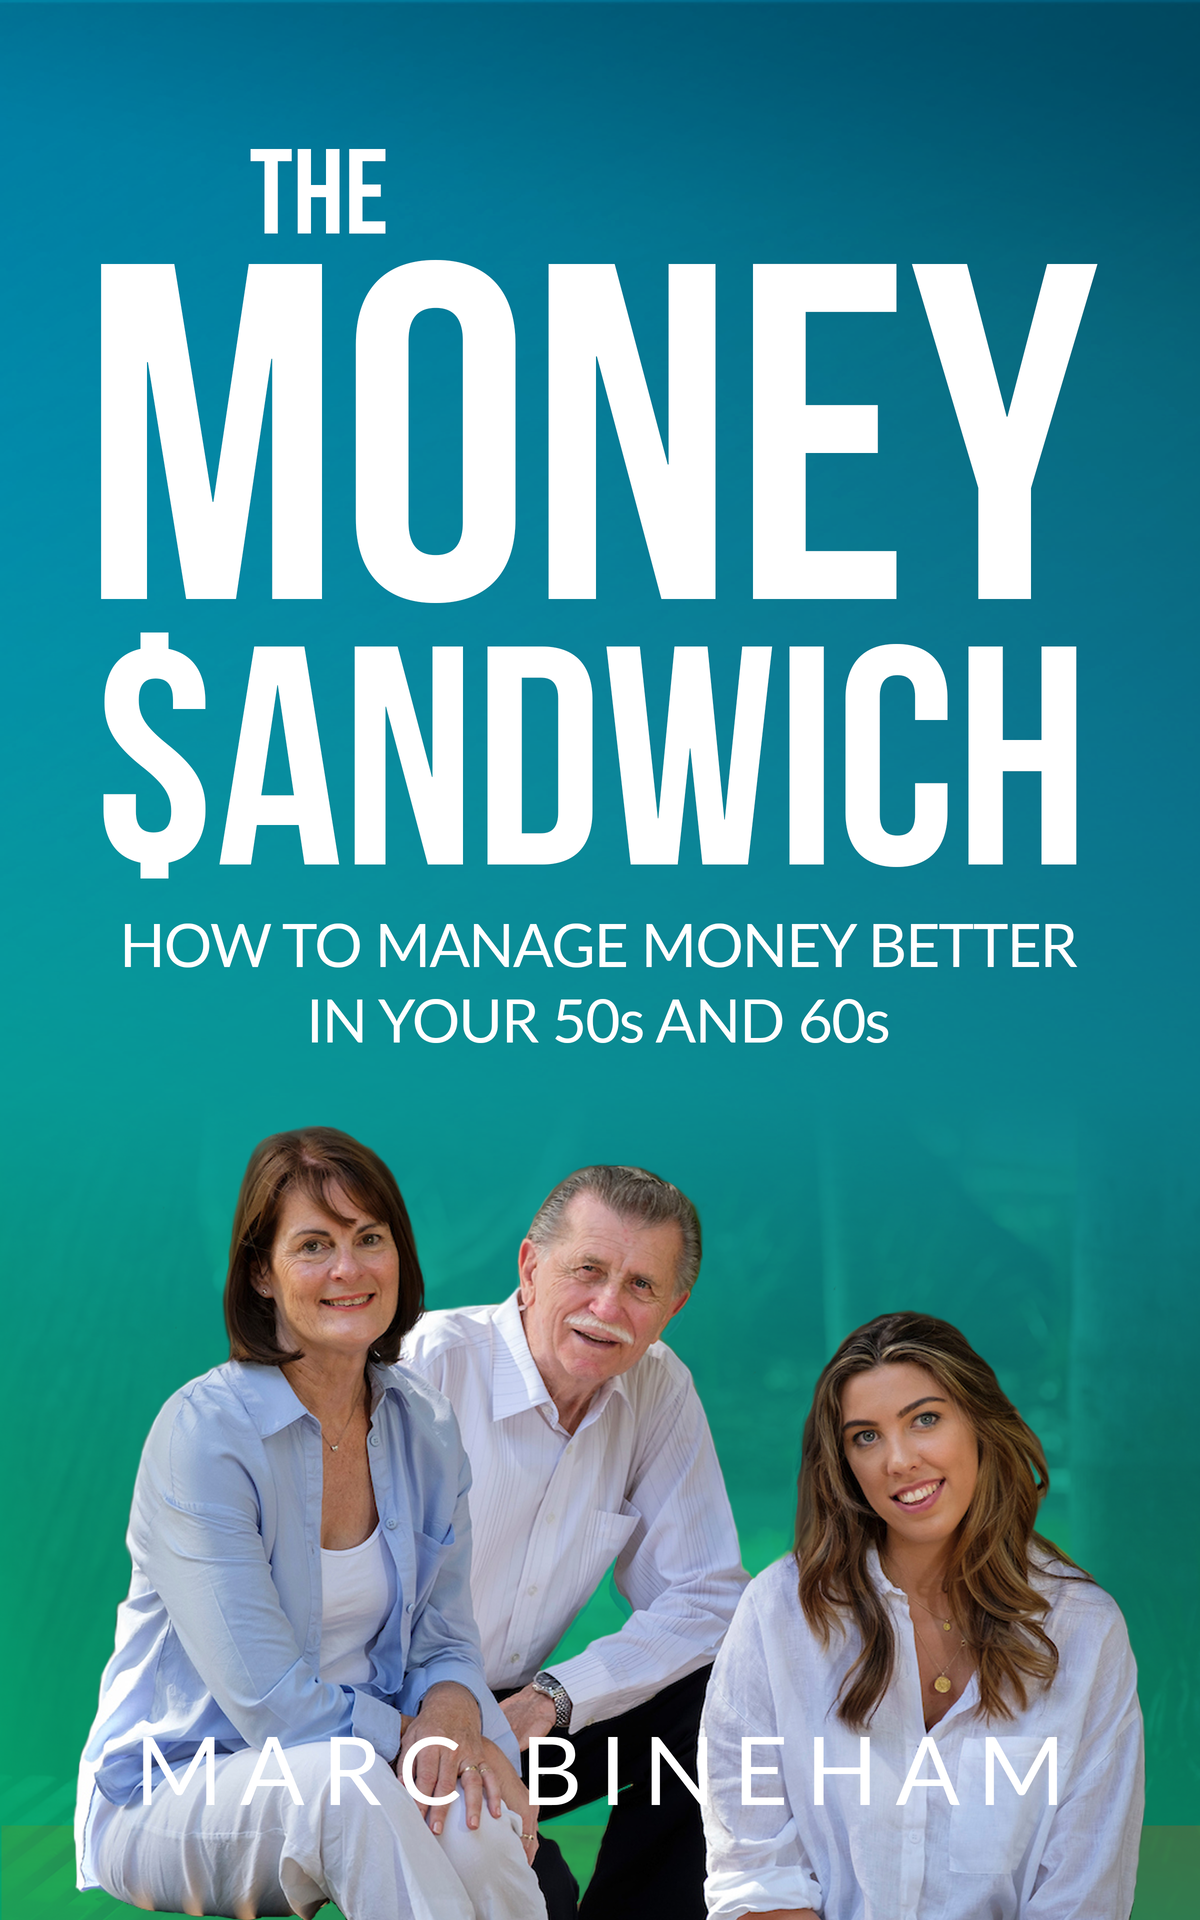 The Money Sandwich